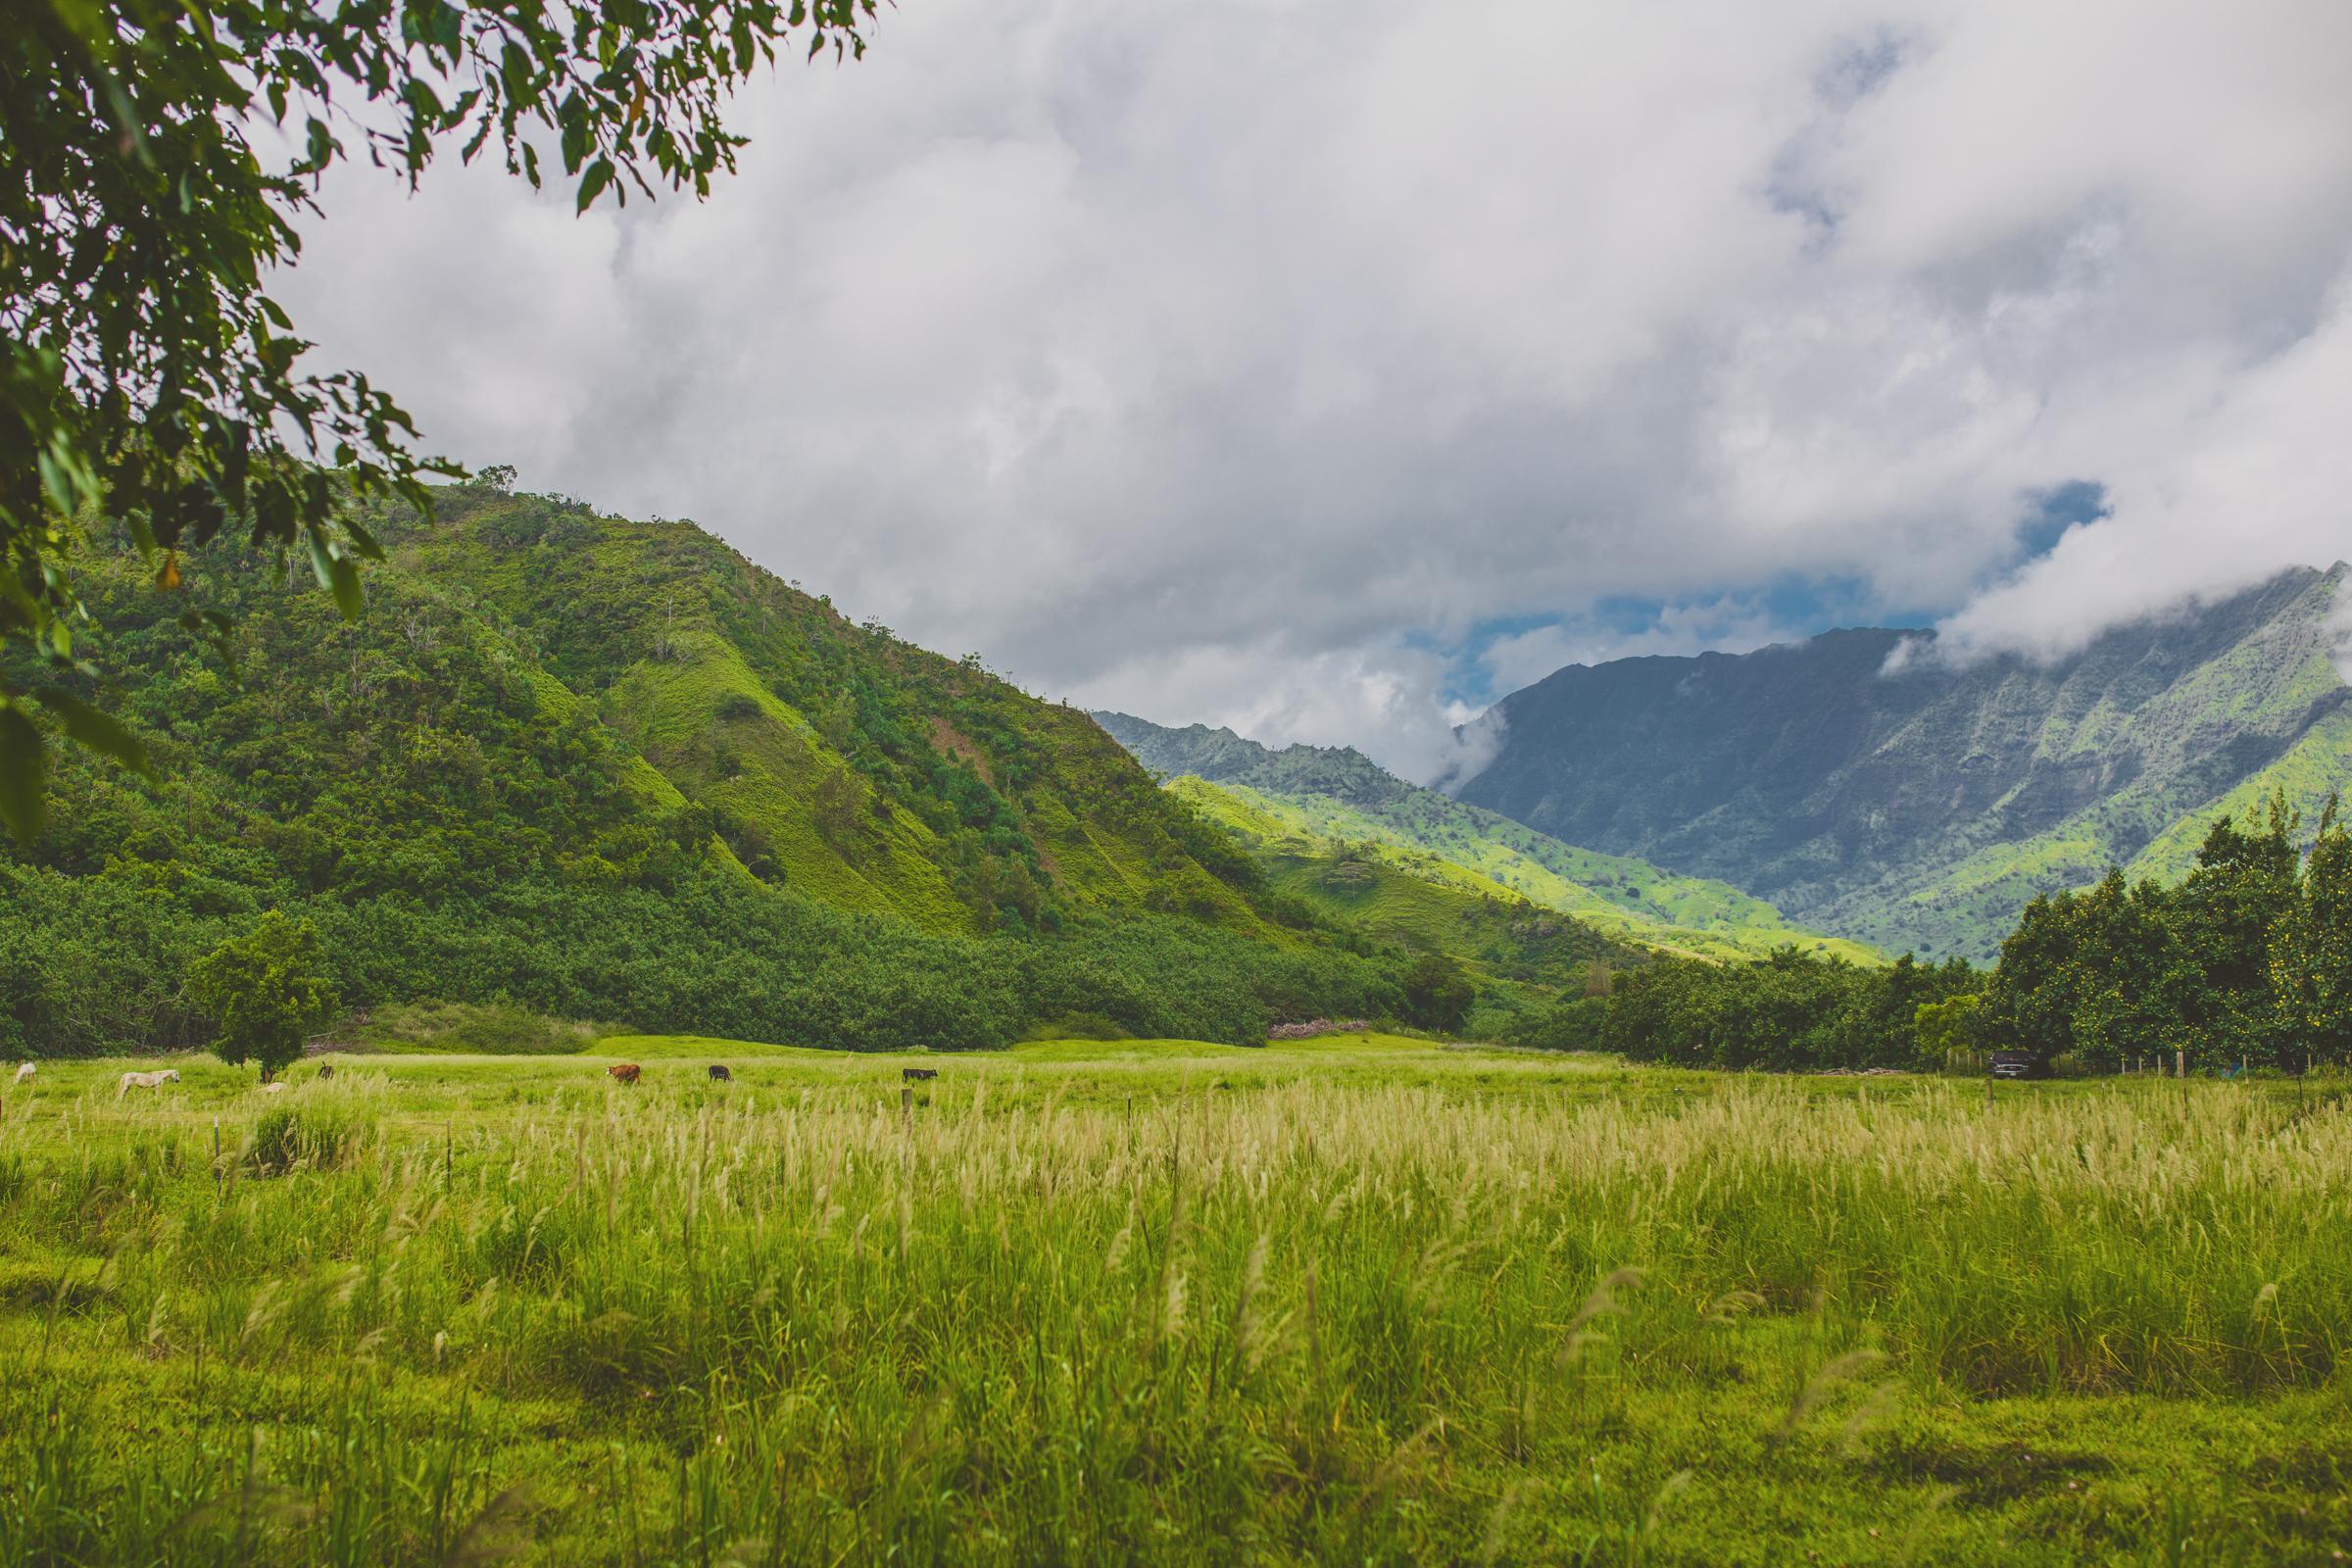 IMG_2381-KAUAI-HAWAII-JENNIFER-PICARD-PHOTOGRAPHY.jpg